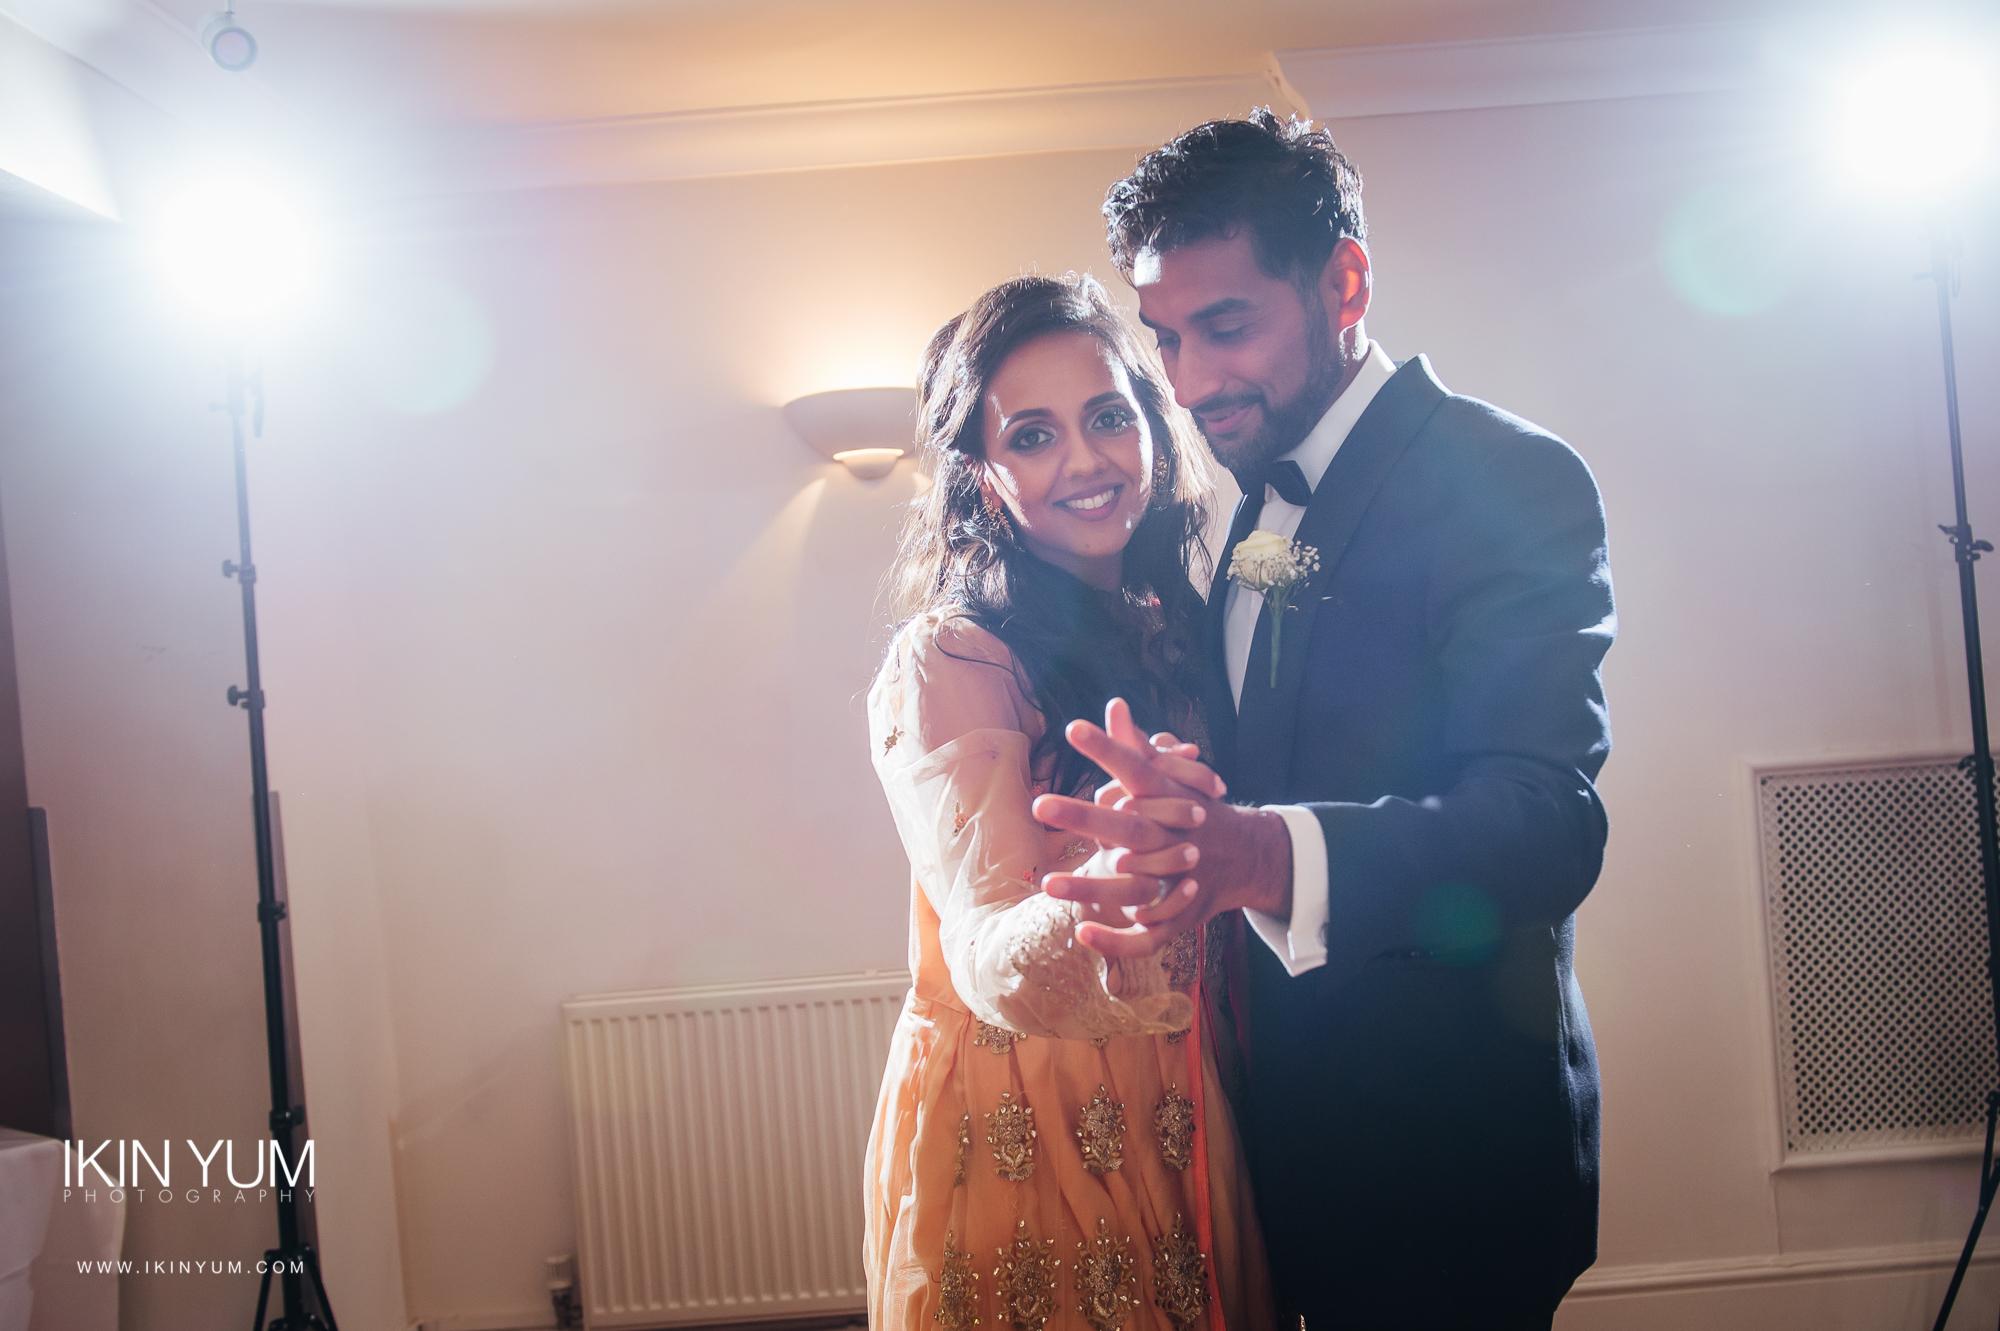 Laura Ashley Manor Wedding - Ikin Yum Photography-137.jpg